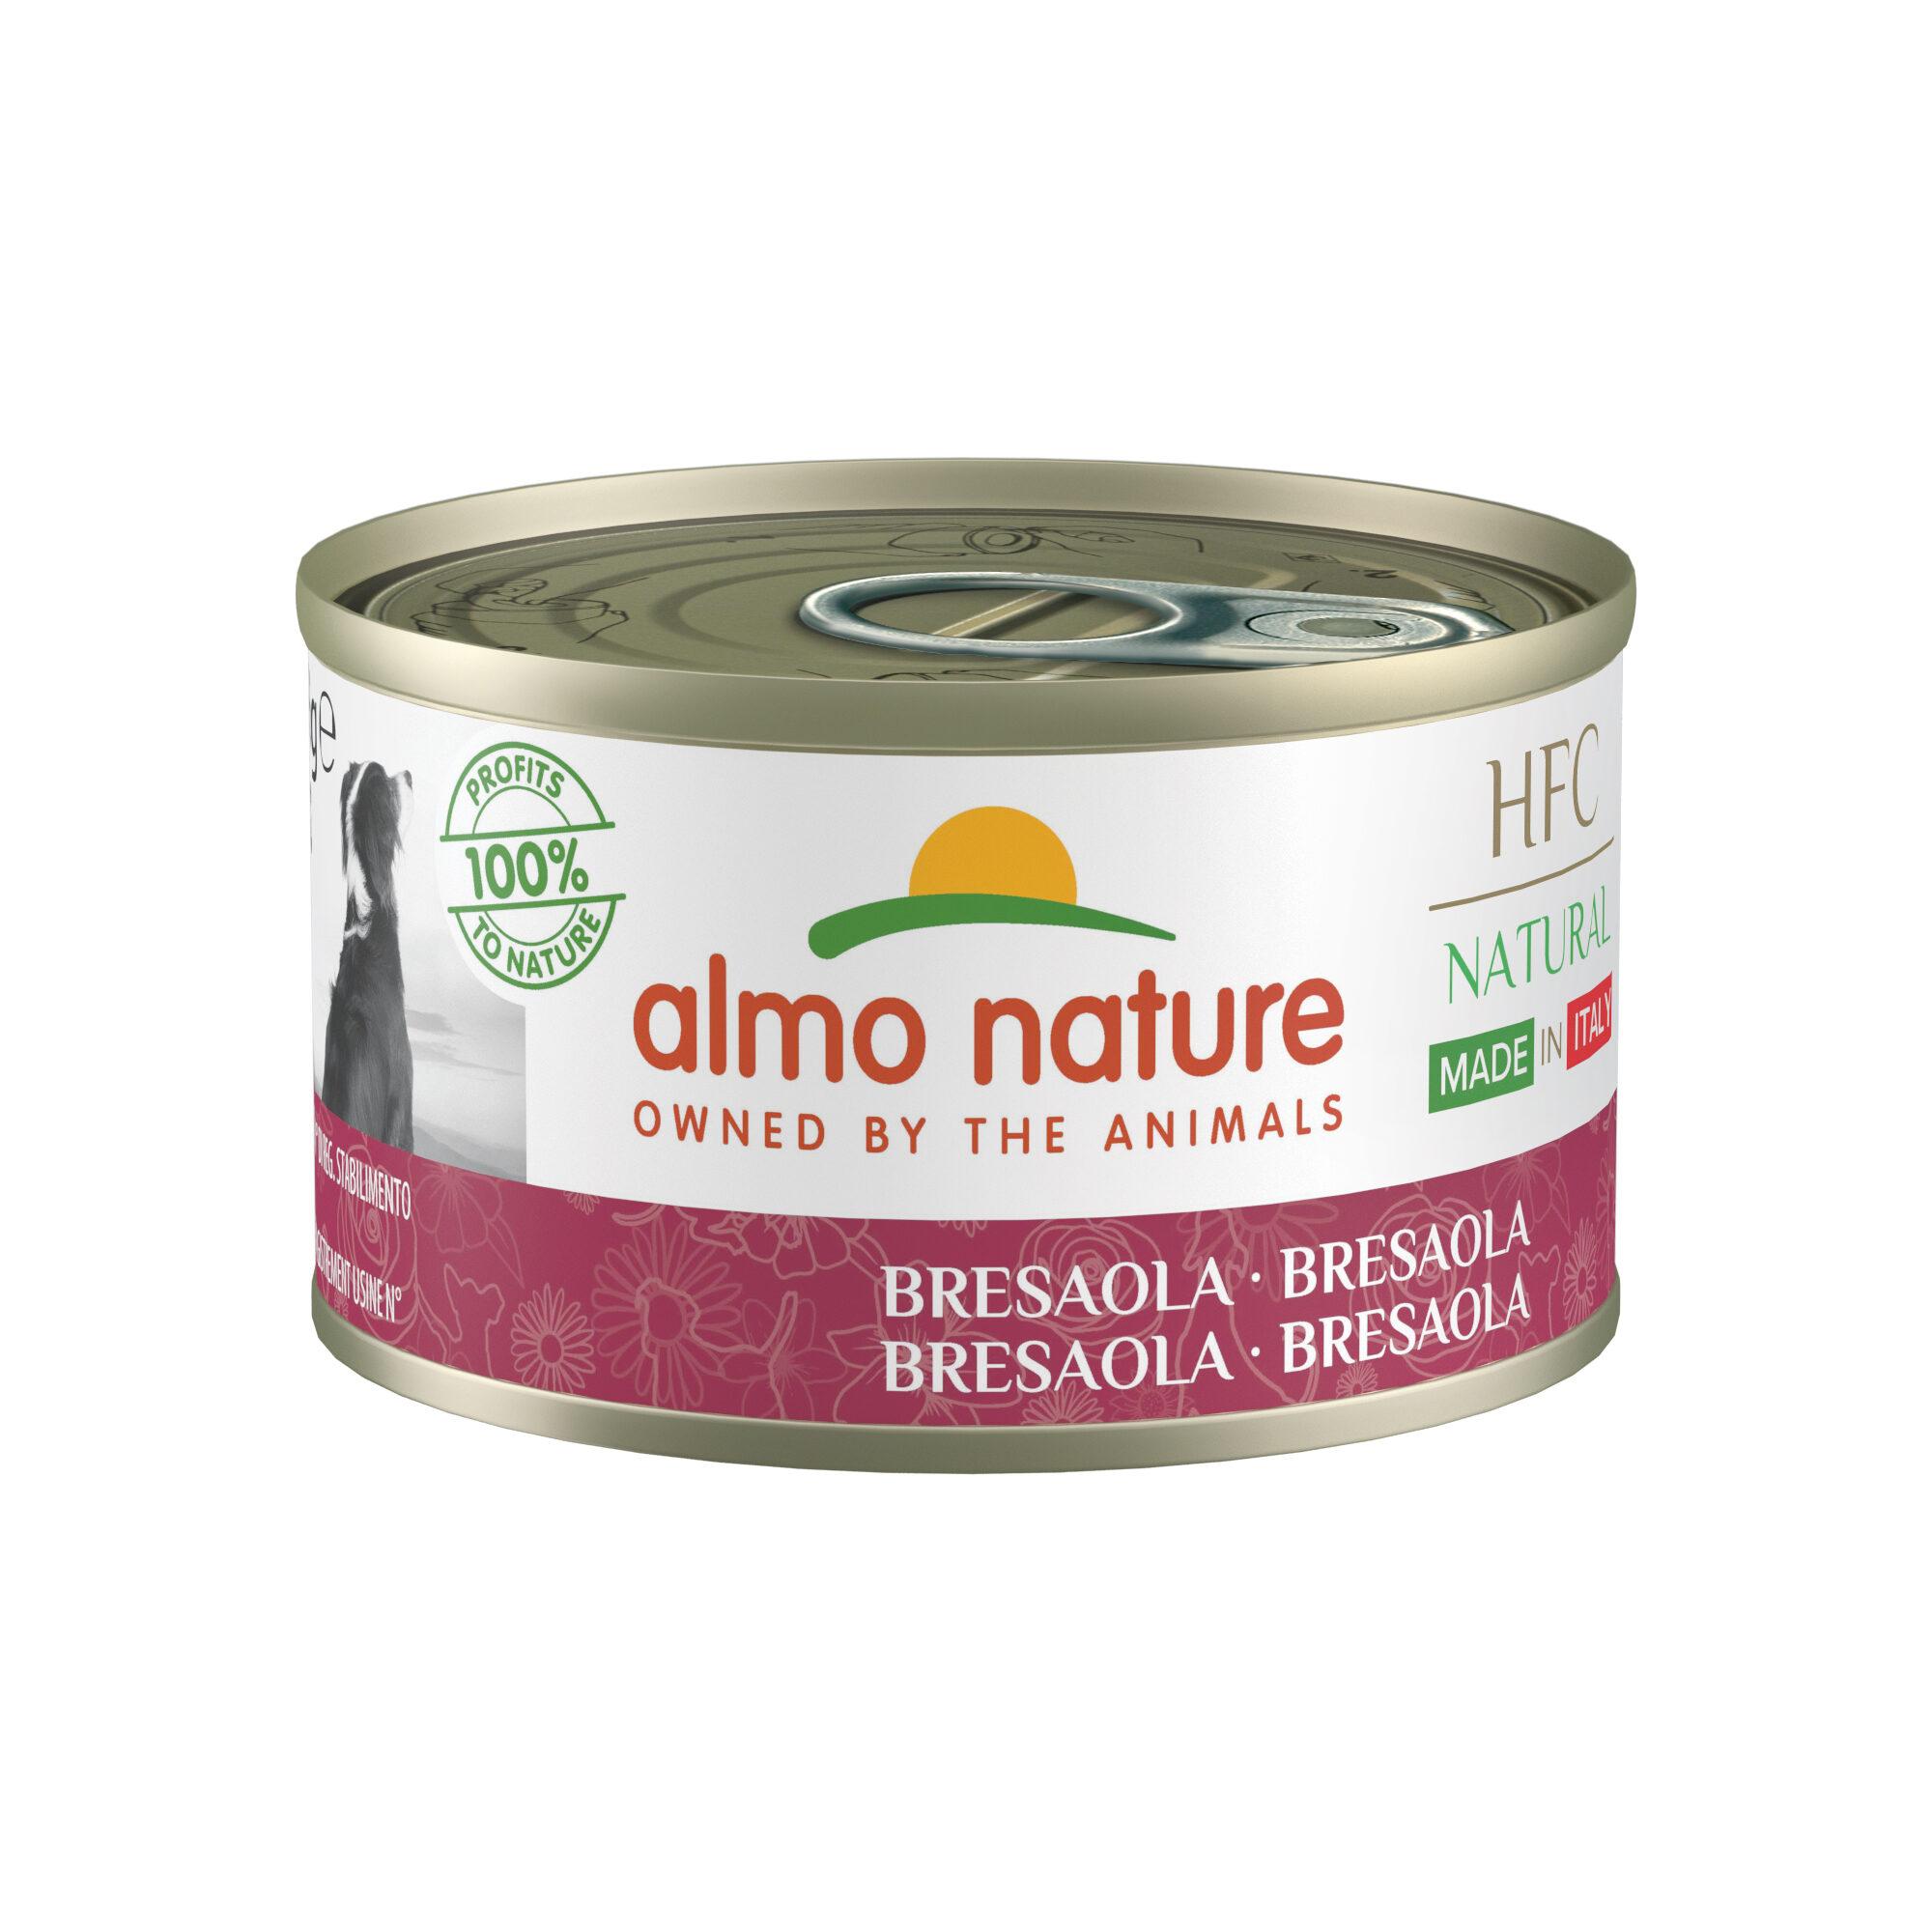 Almo Nature HFC Natural Made en Italy - Bresaola